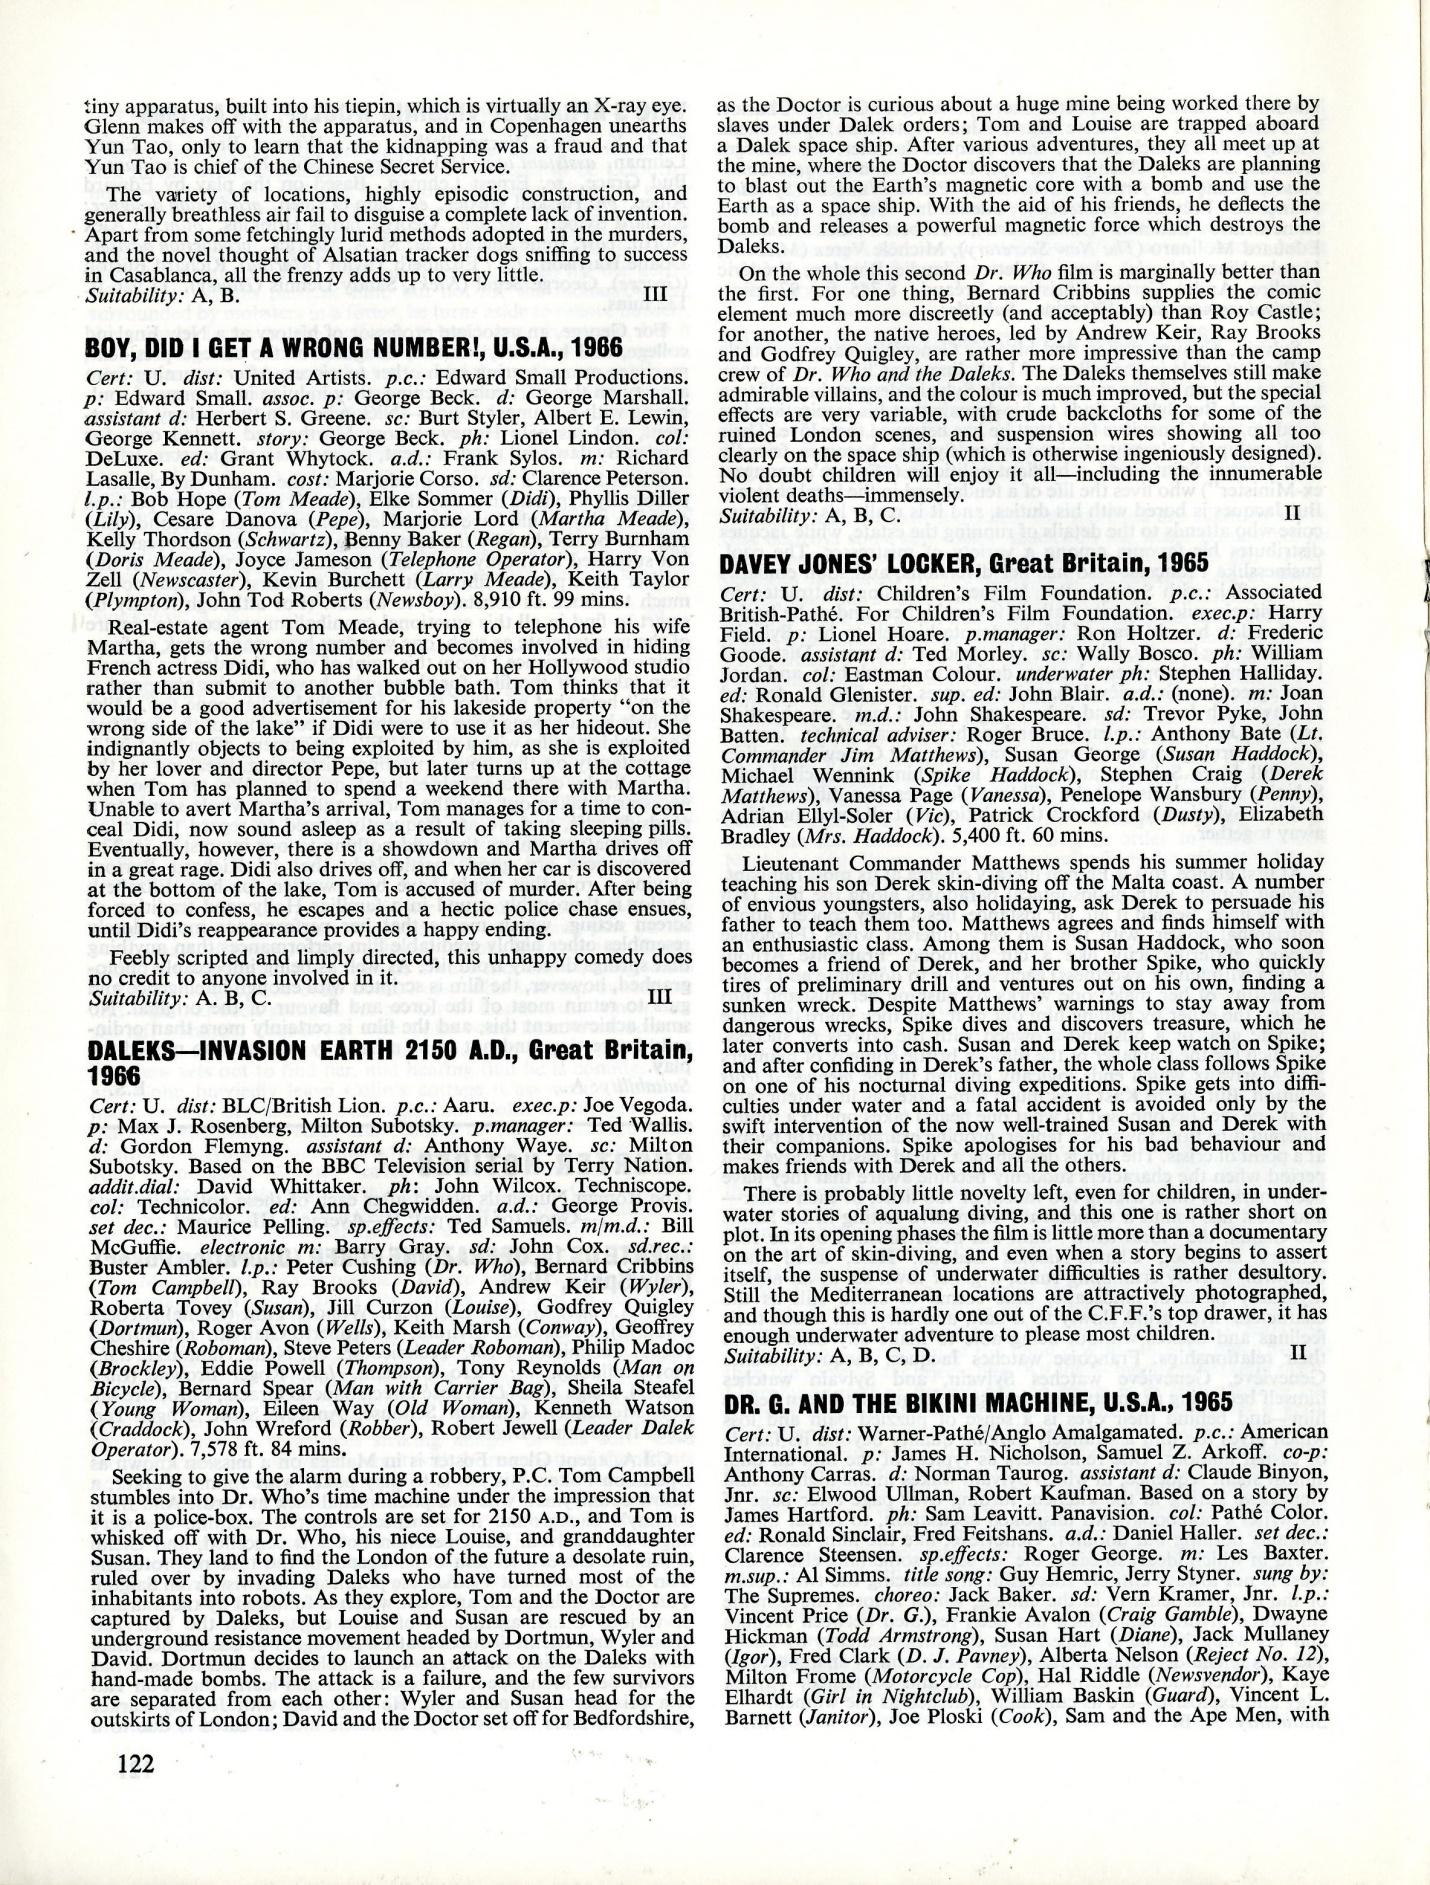 BFI Monthly Film Bulletin, August 1966